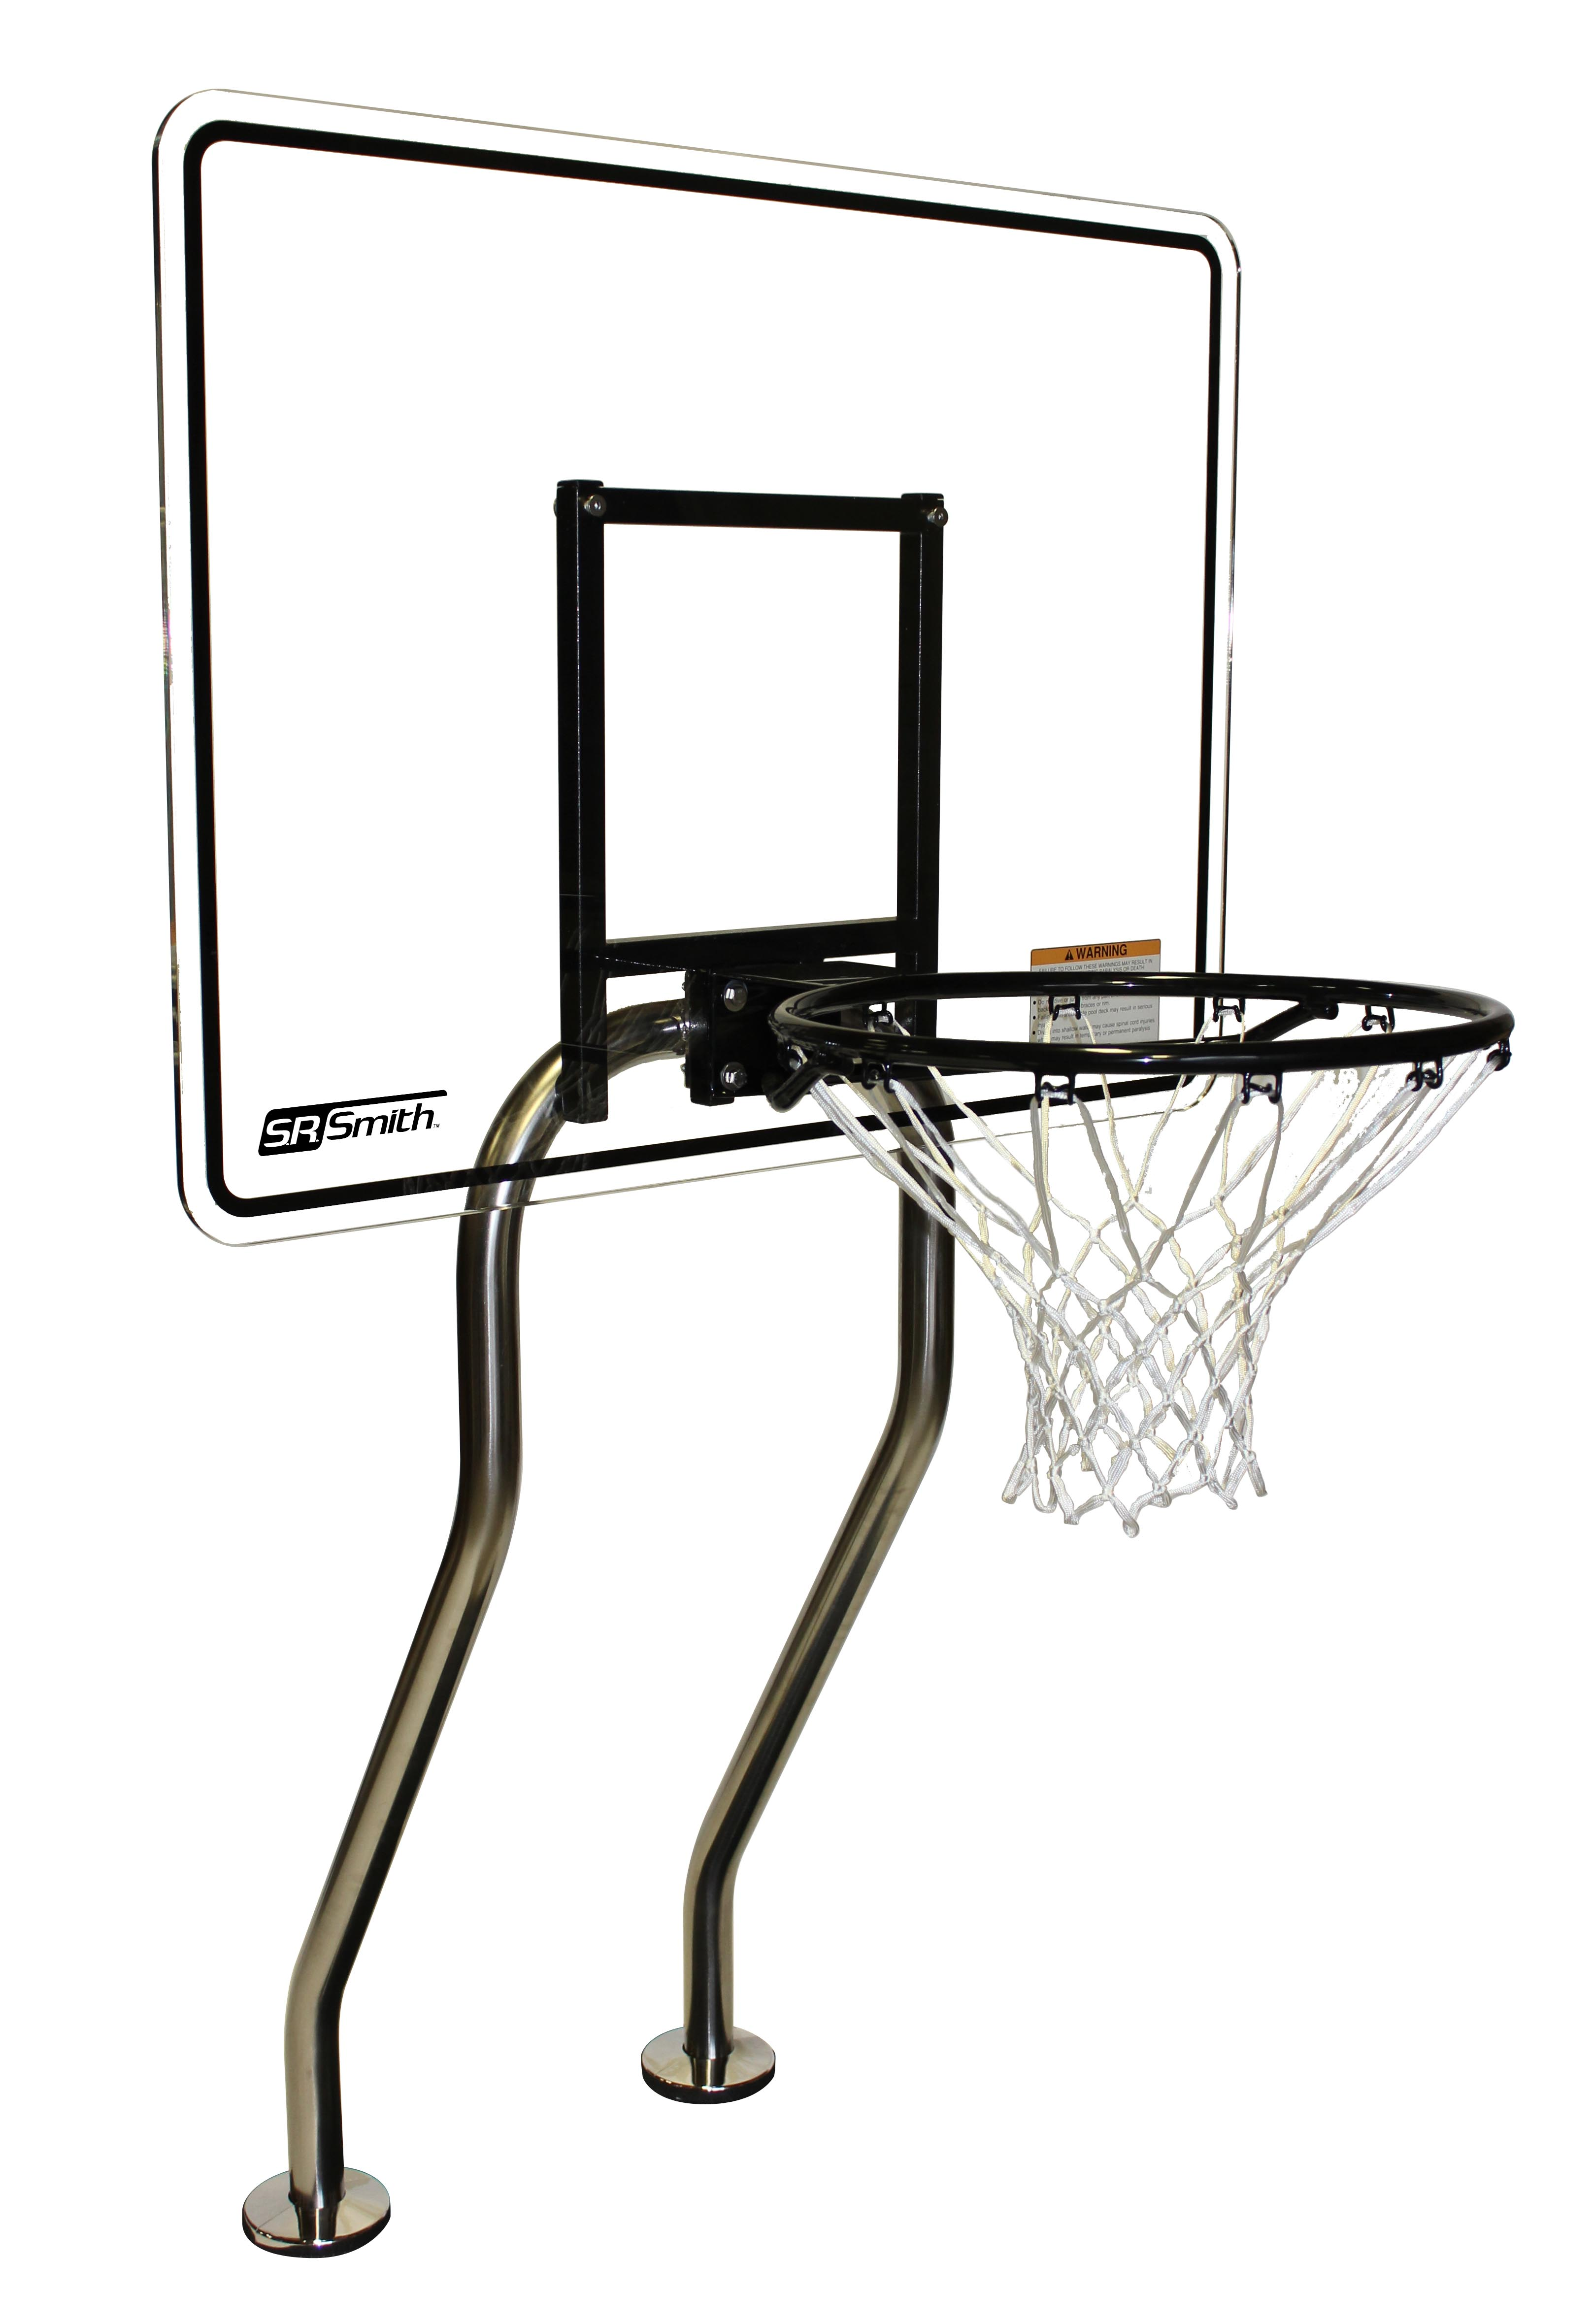 Goaliath 54 In Ground Basketball Hoop All Basketball Scores Info